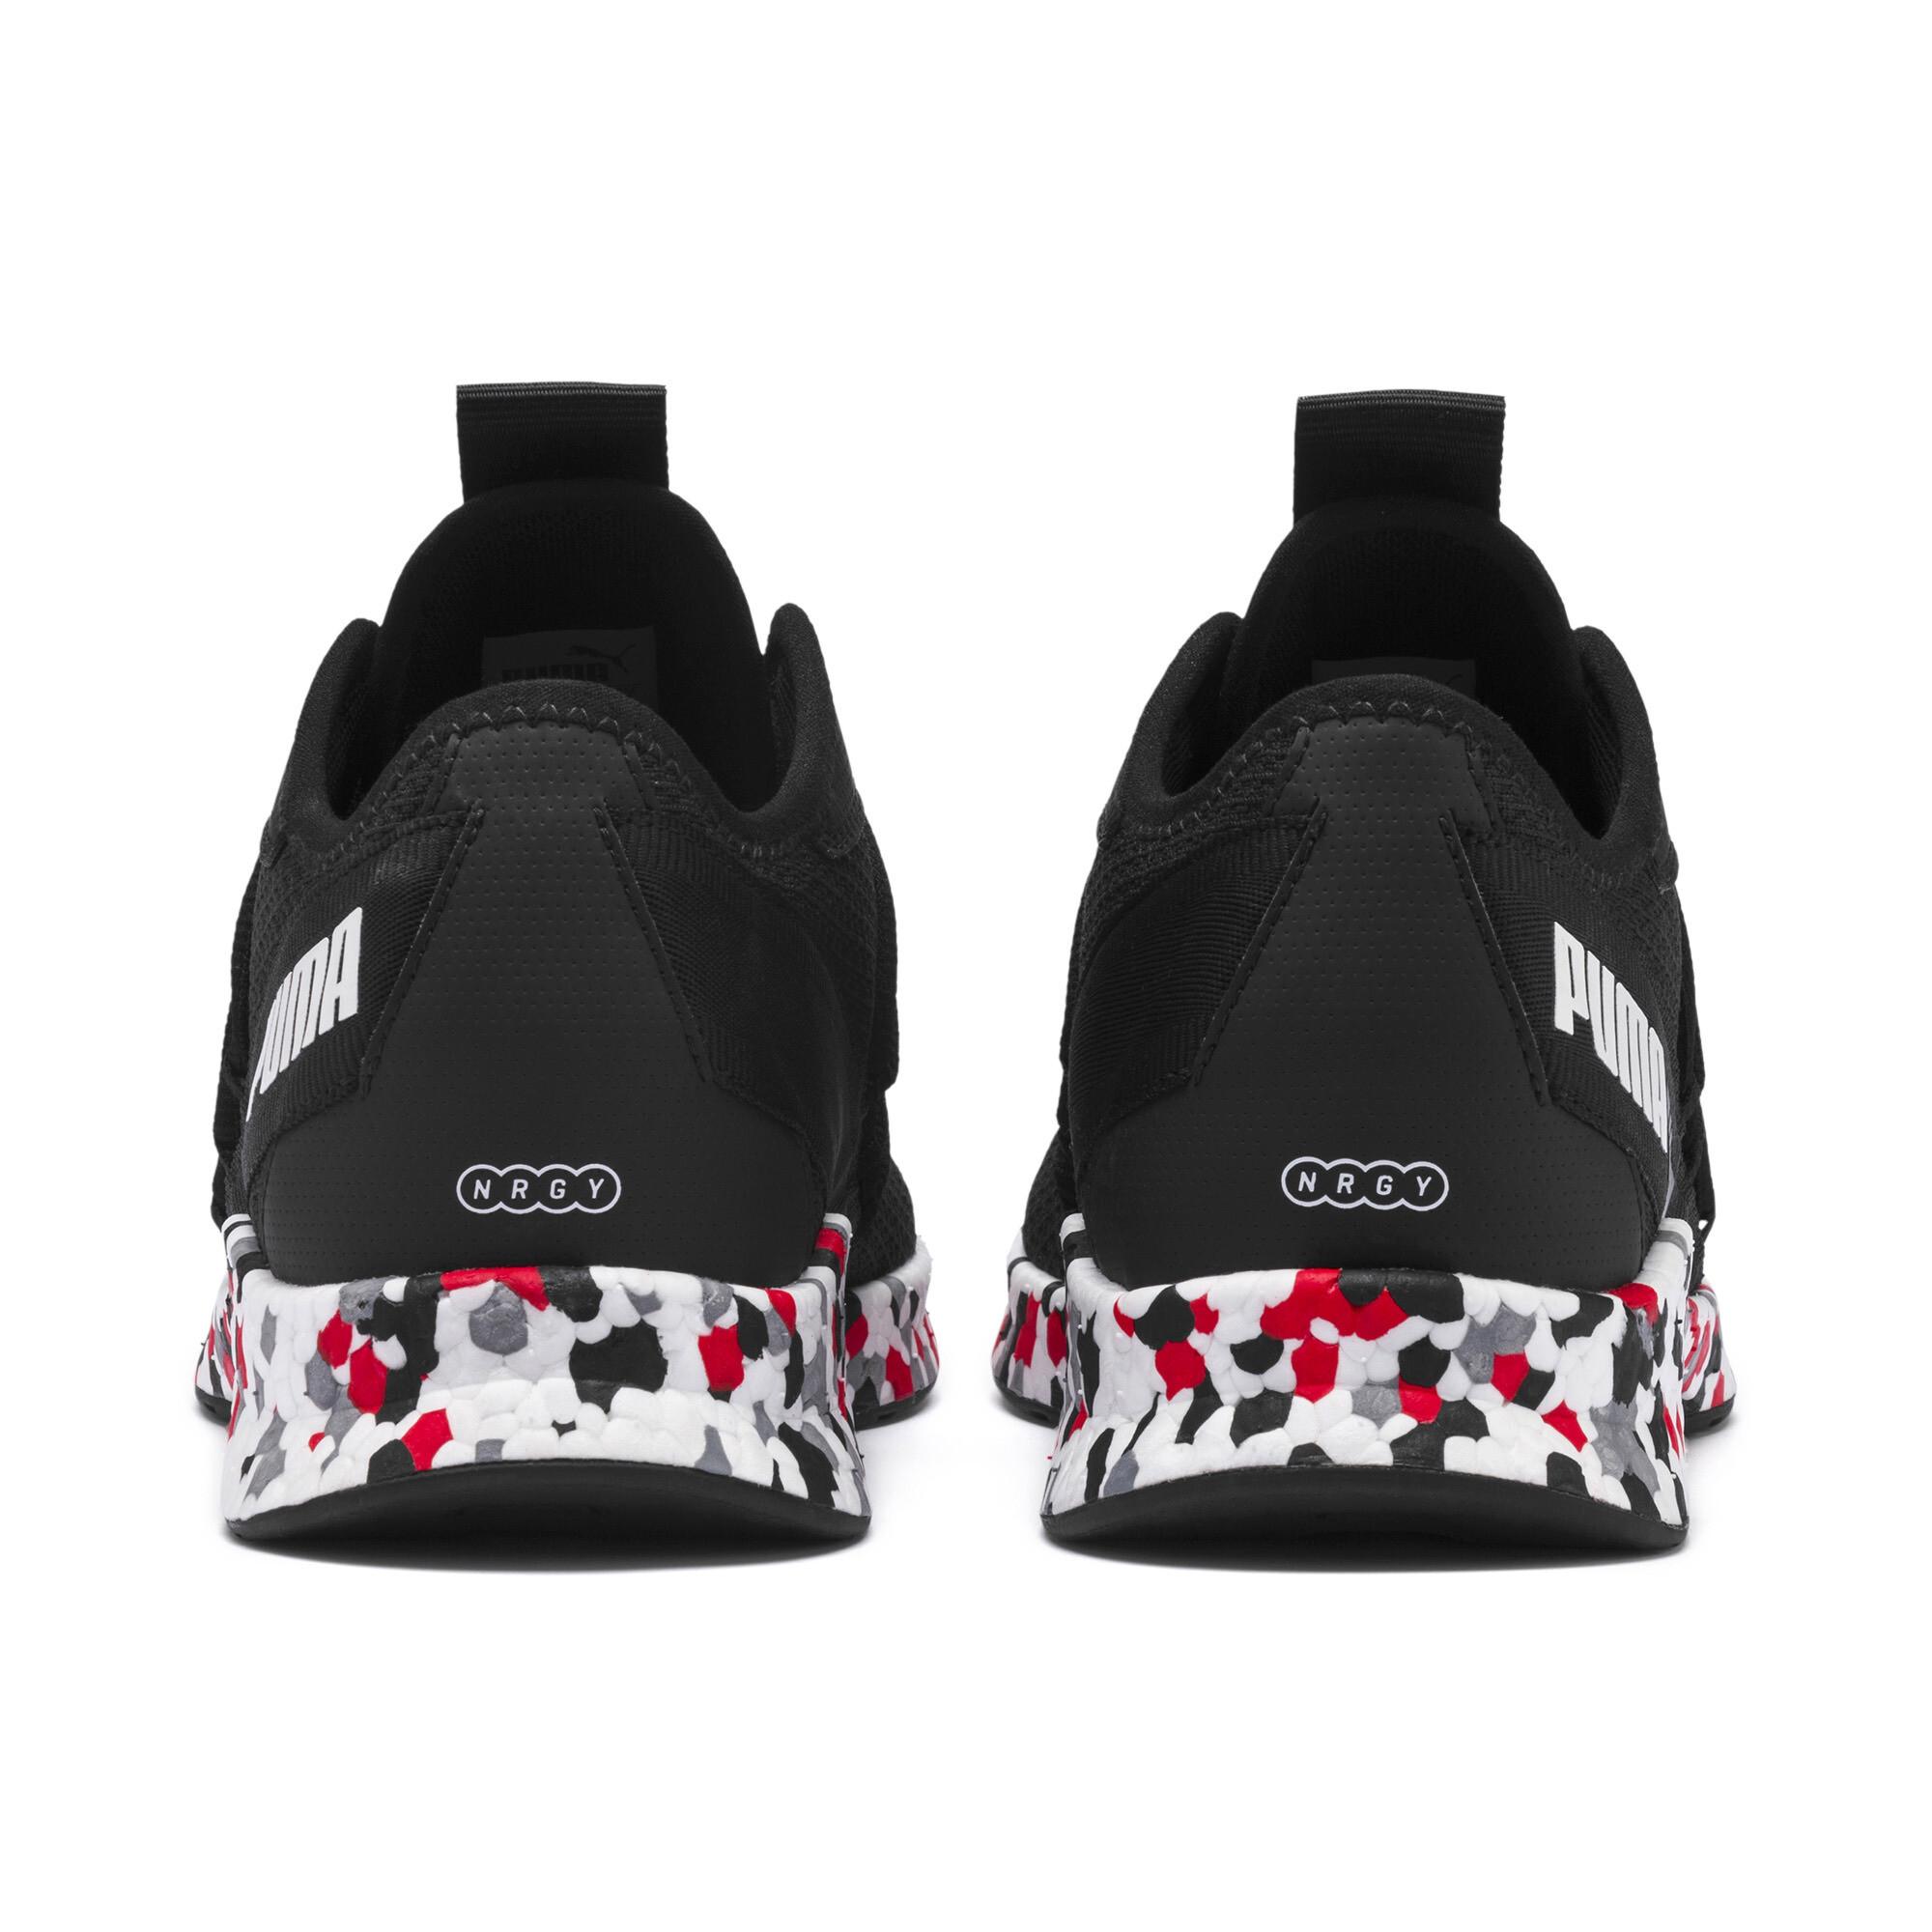 PUMA-NRGY-Star-Multi-Men-039-s-Running-Shoes-Unisex-Shoe-Running thumbnail 3